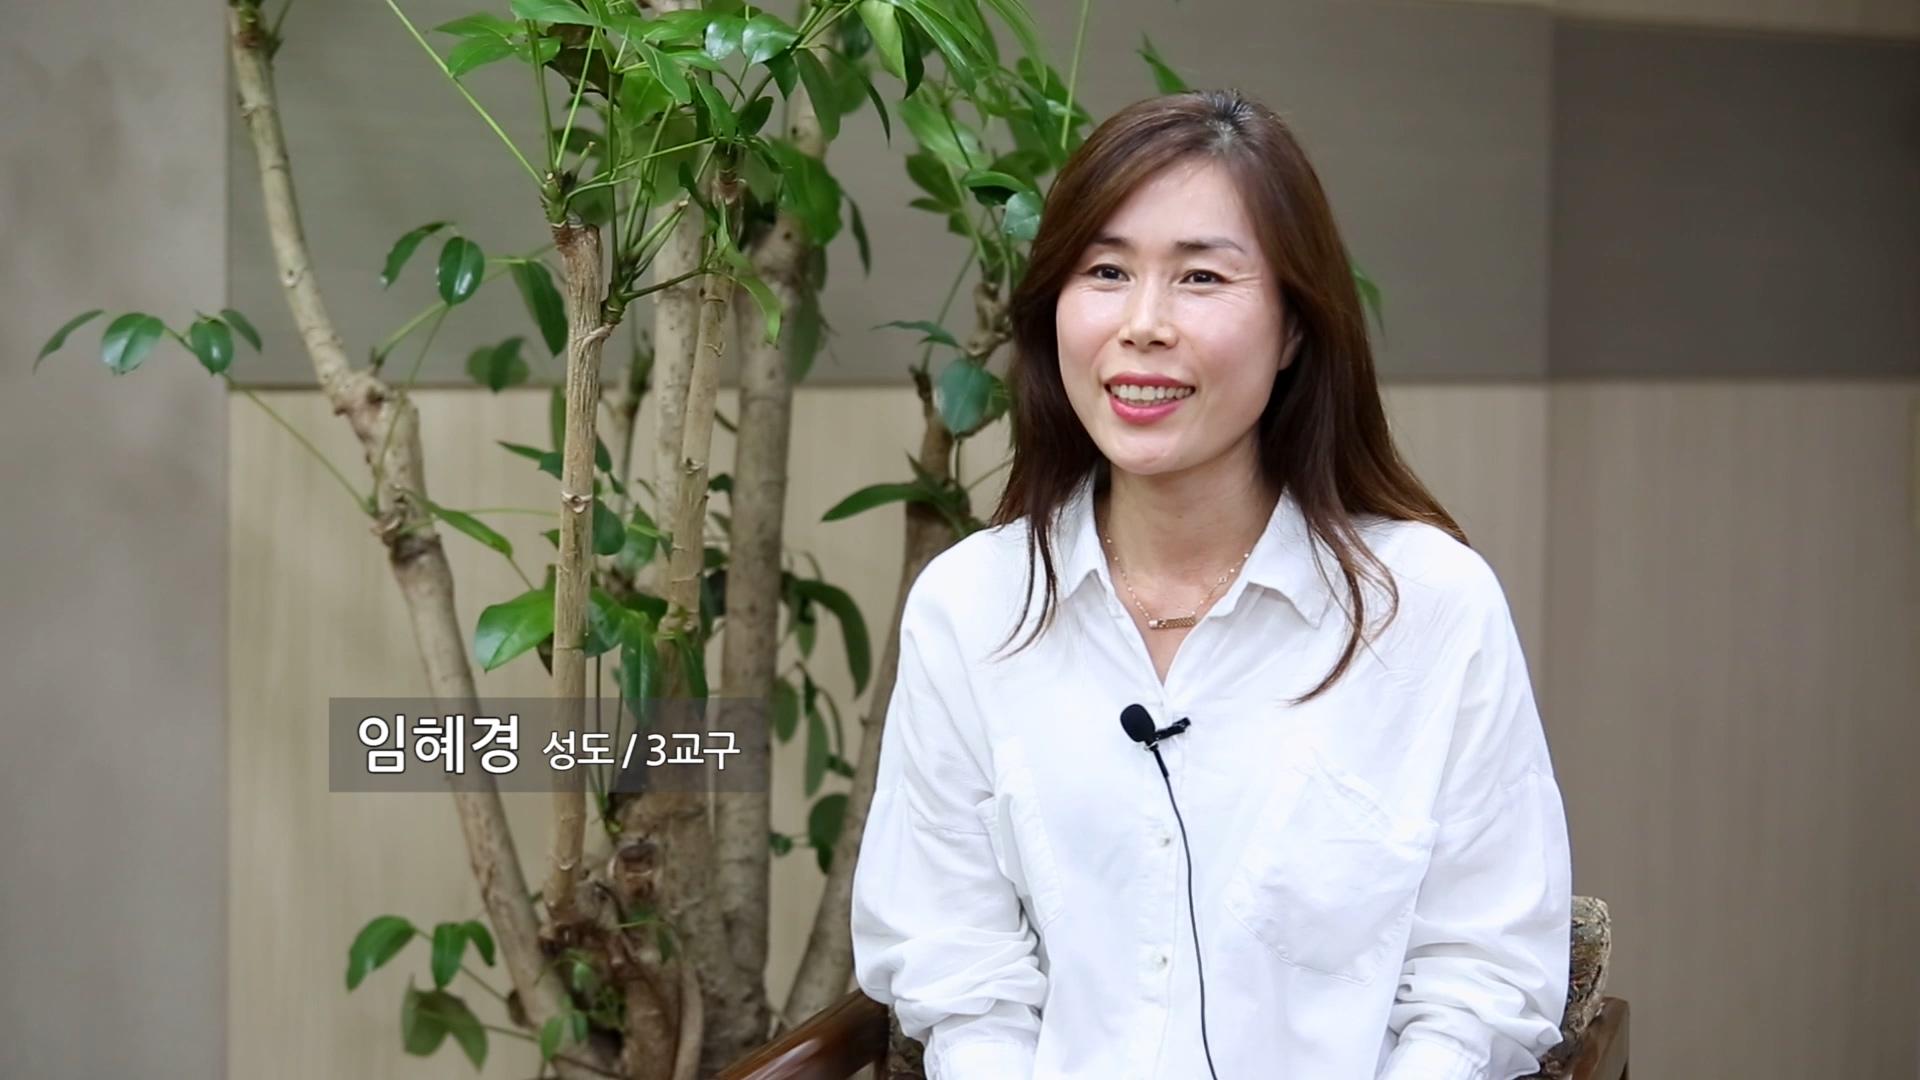 Happy People_191006_가을특새 인터뷰.mp4_20191006_161029.914.jpg